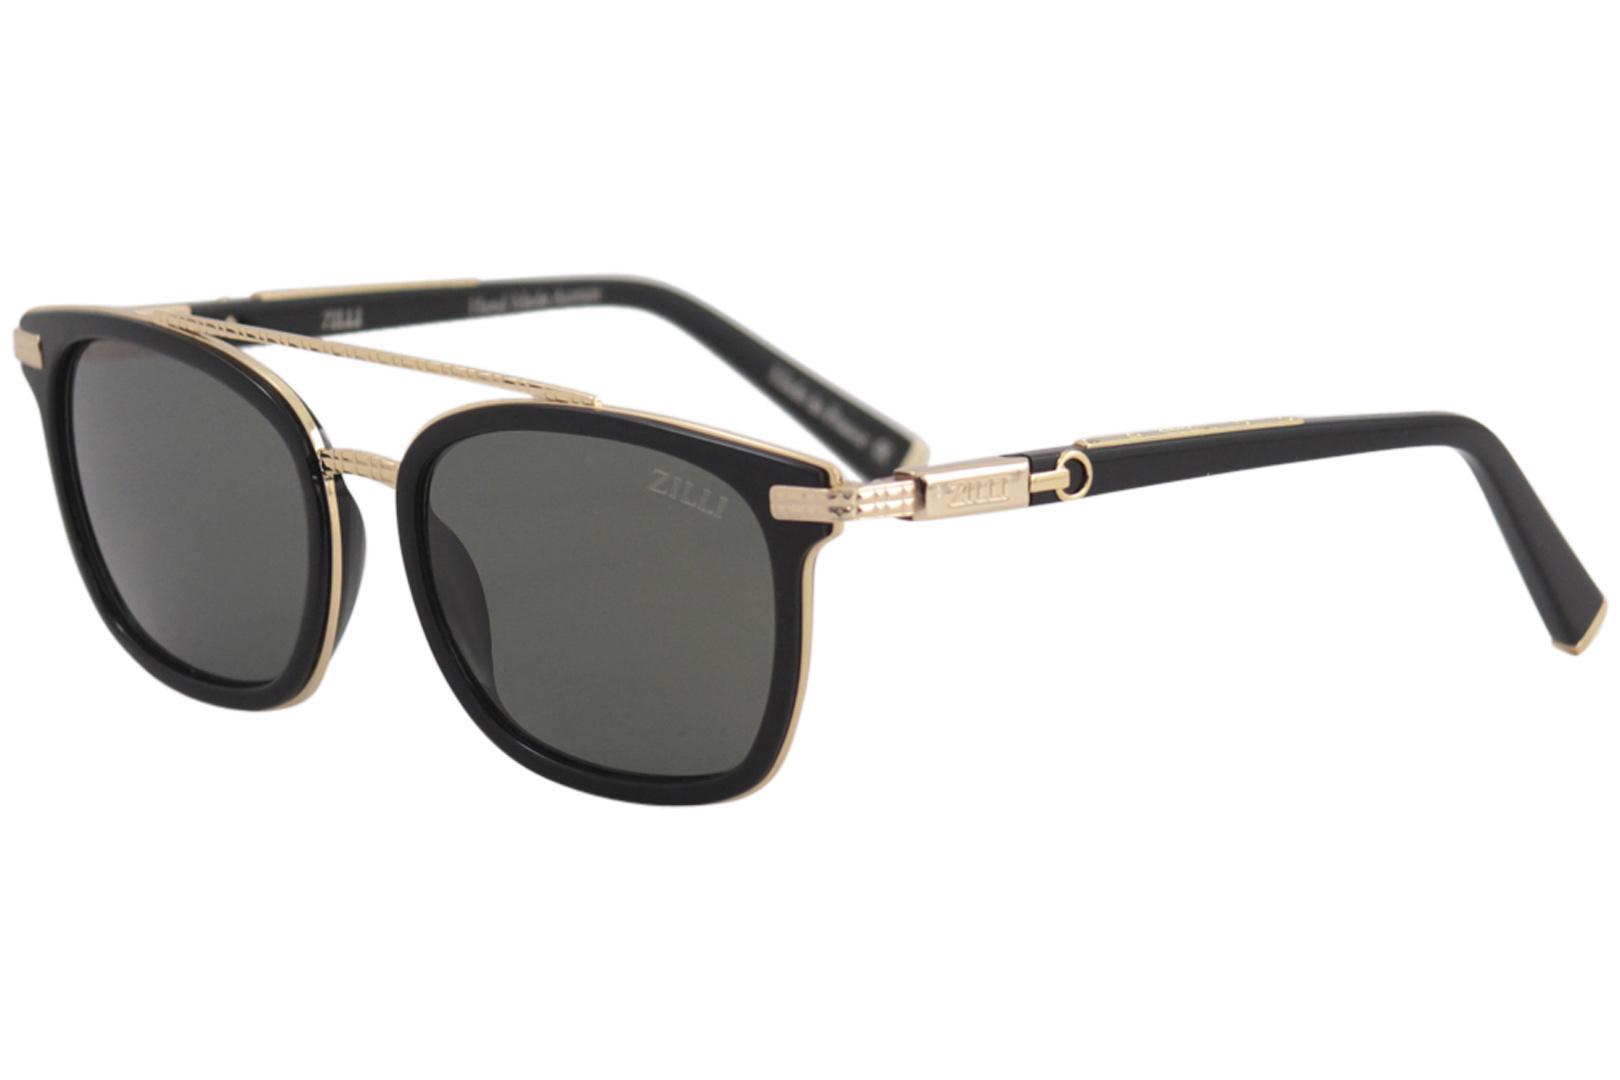 55e4b5917c7 Zilli Men s ZI65014 ZI 65014 Fashion Pilot Polarized Sunglasses